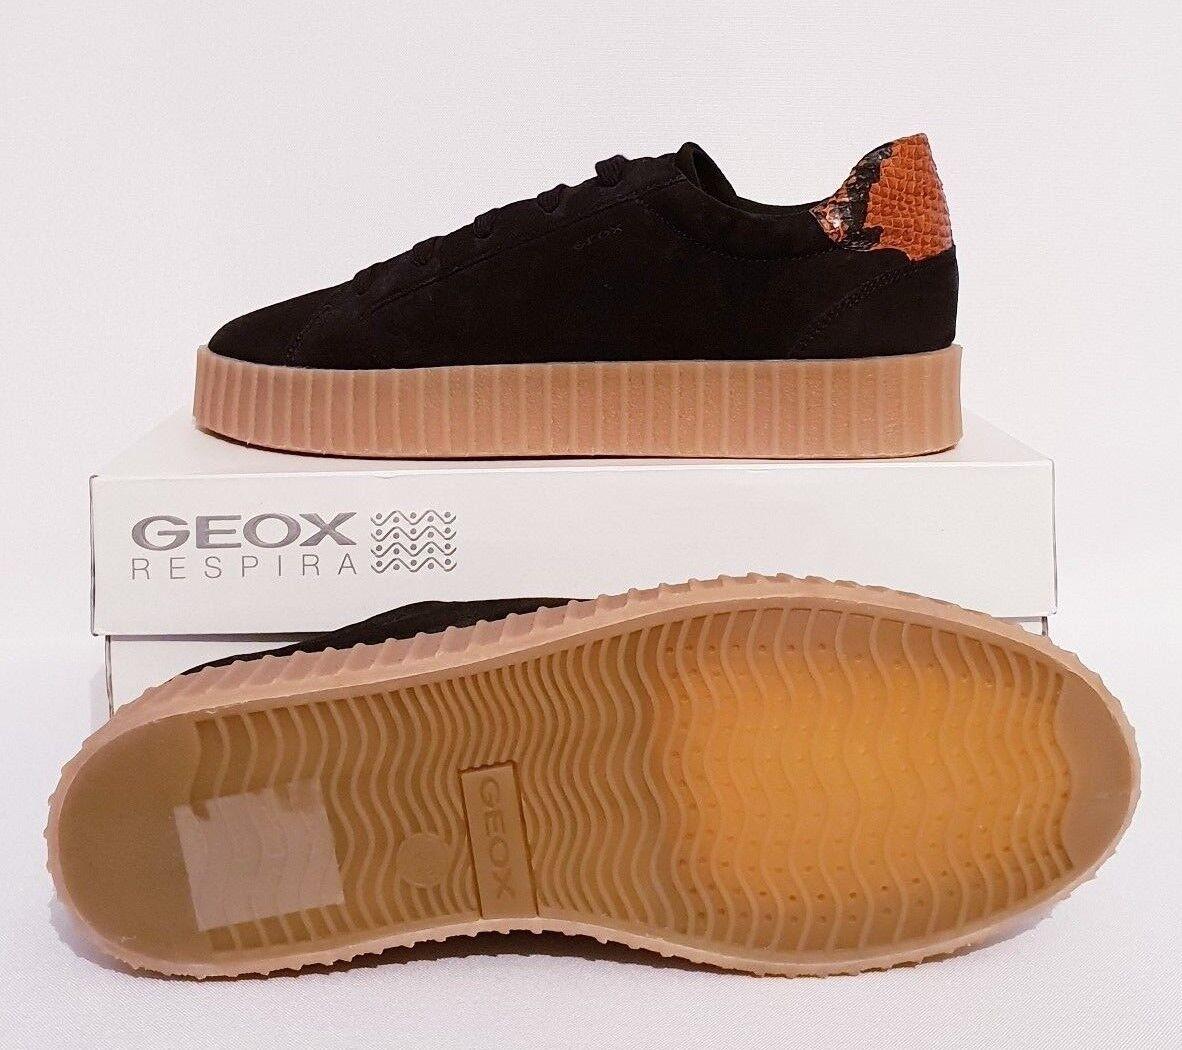 GEOX BLACK RESPIRA HIDENCE D6434B  NAVY Blau BLACK GEOX SUEDE LACE UP Schuhe TRAINERS b28ffa